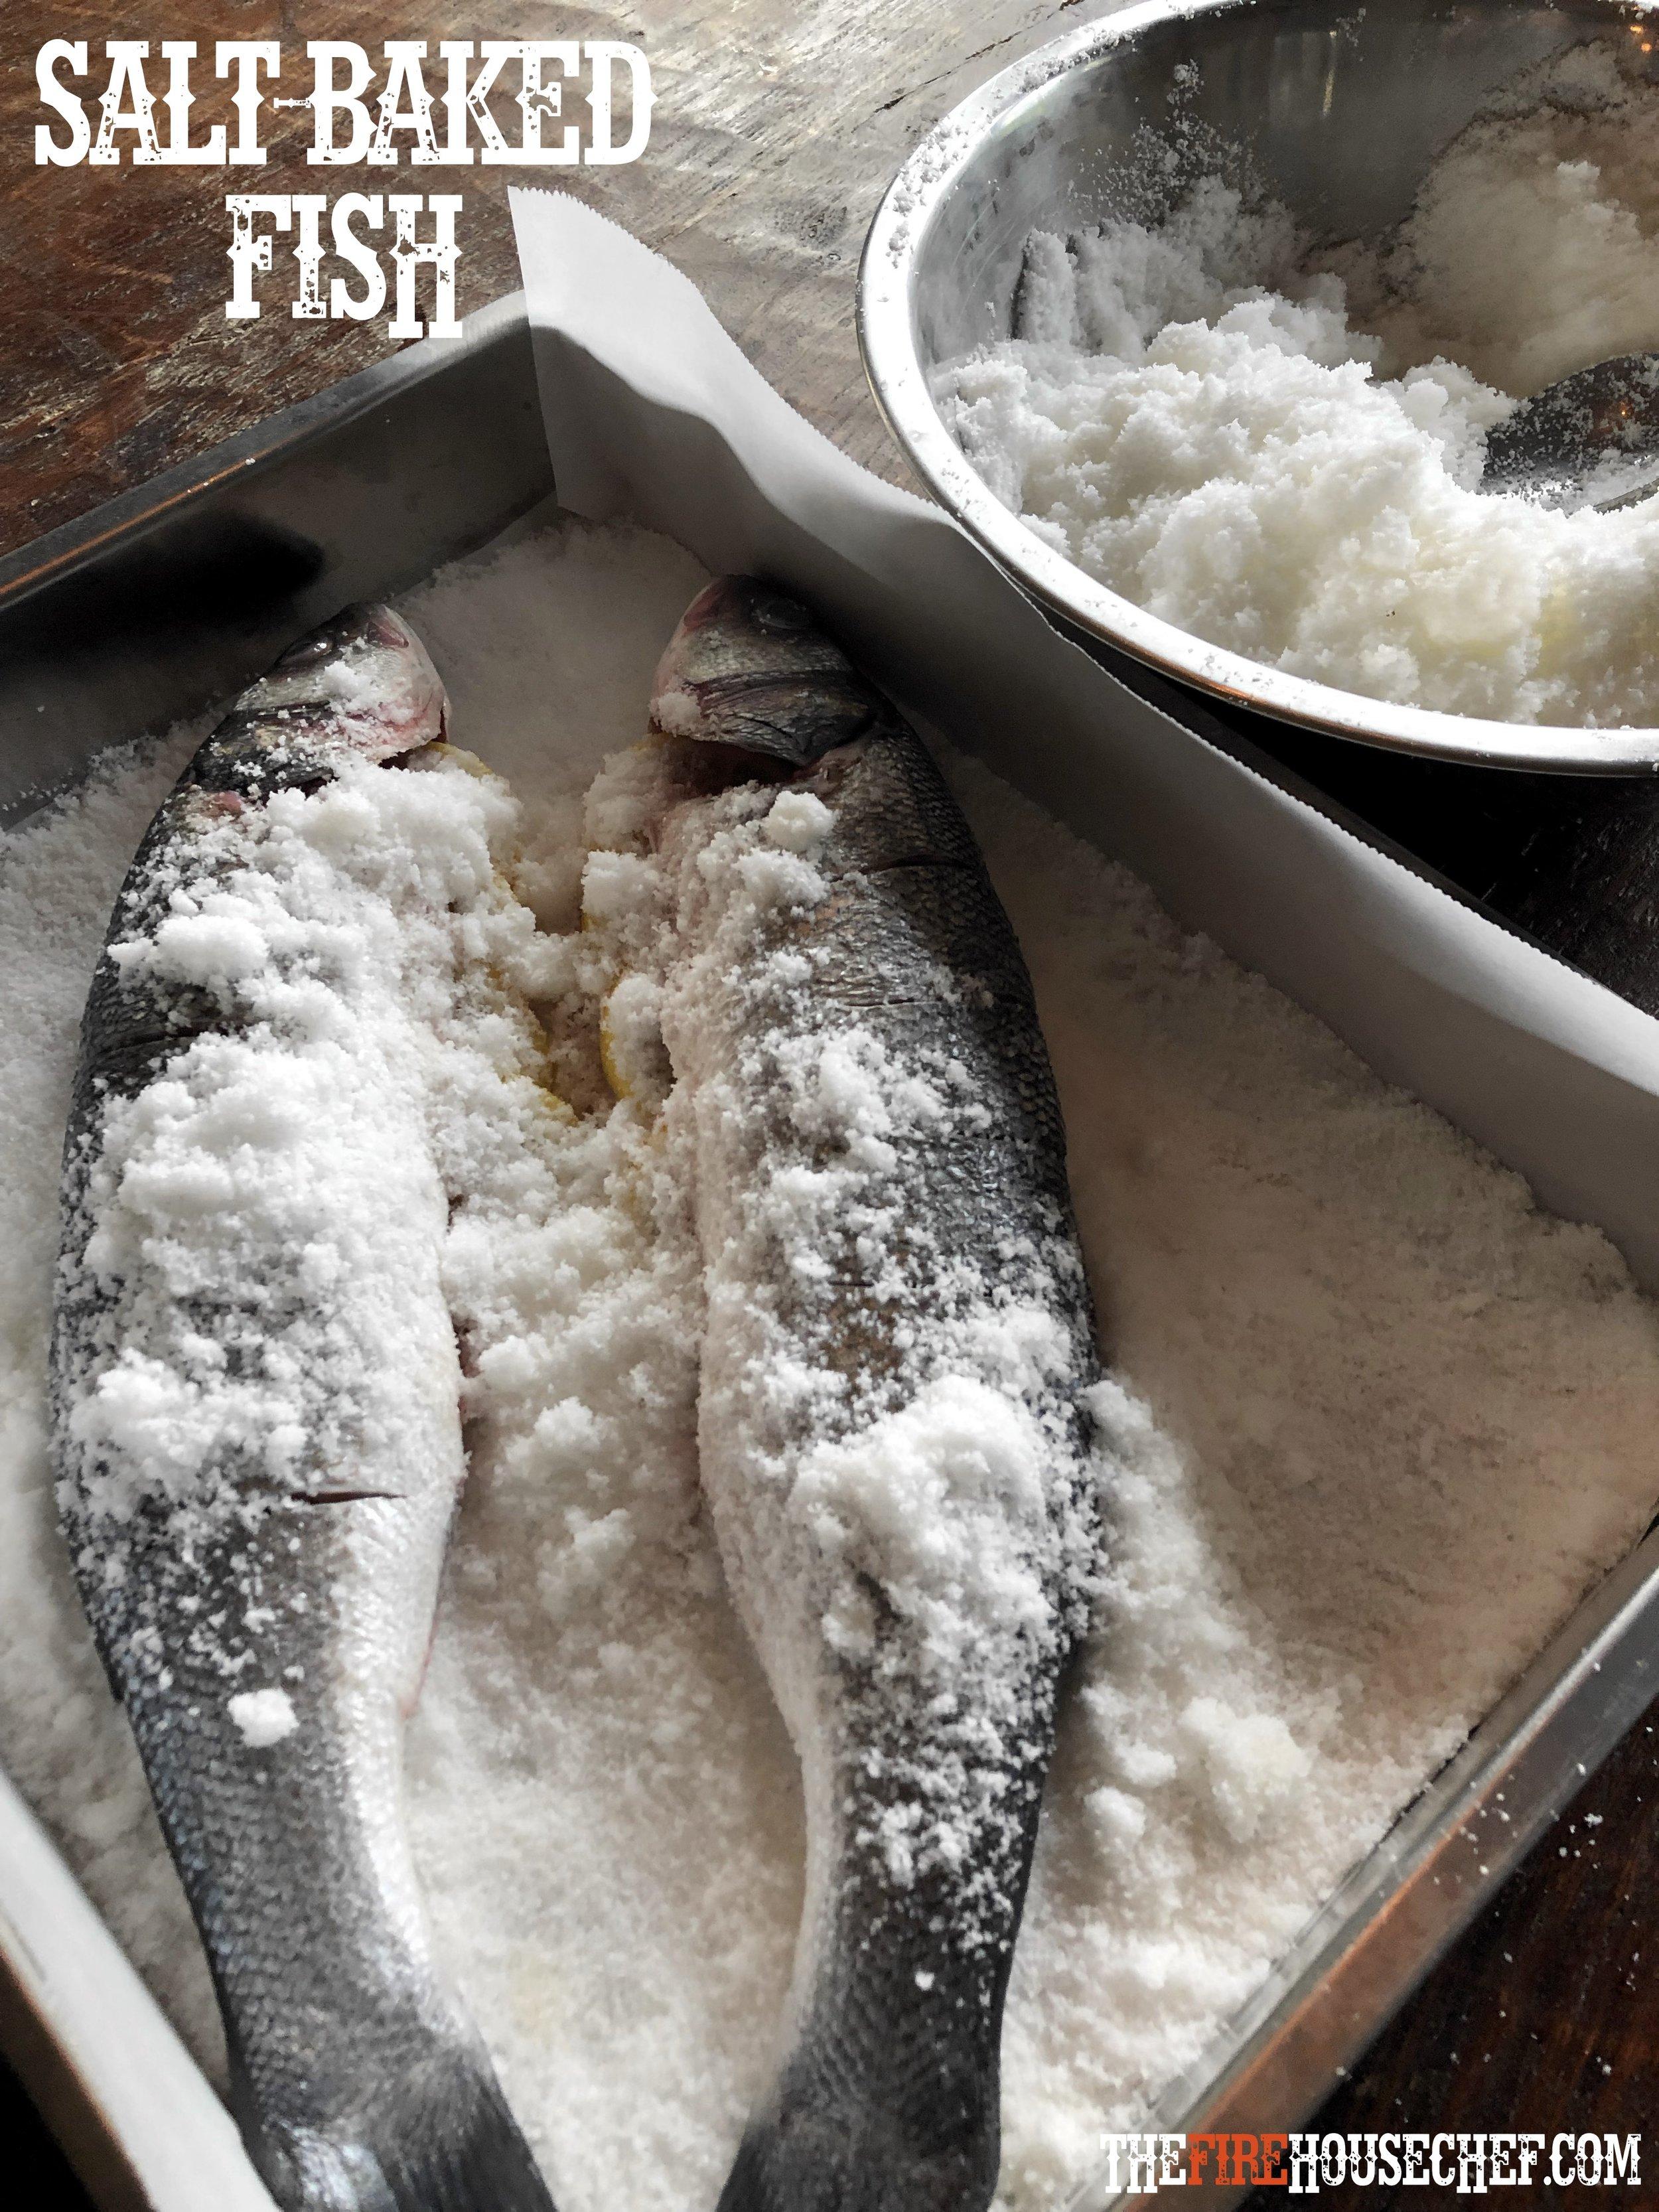 Salt-Baked Fish Promo Pic.jpg